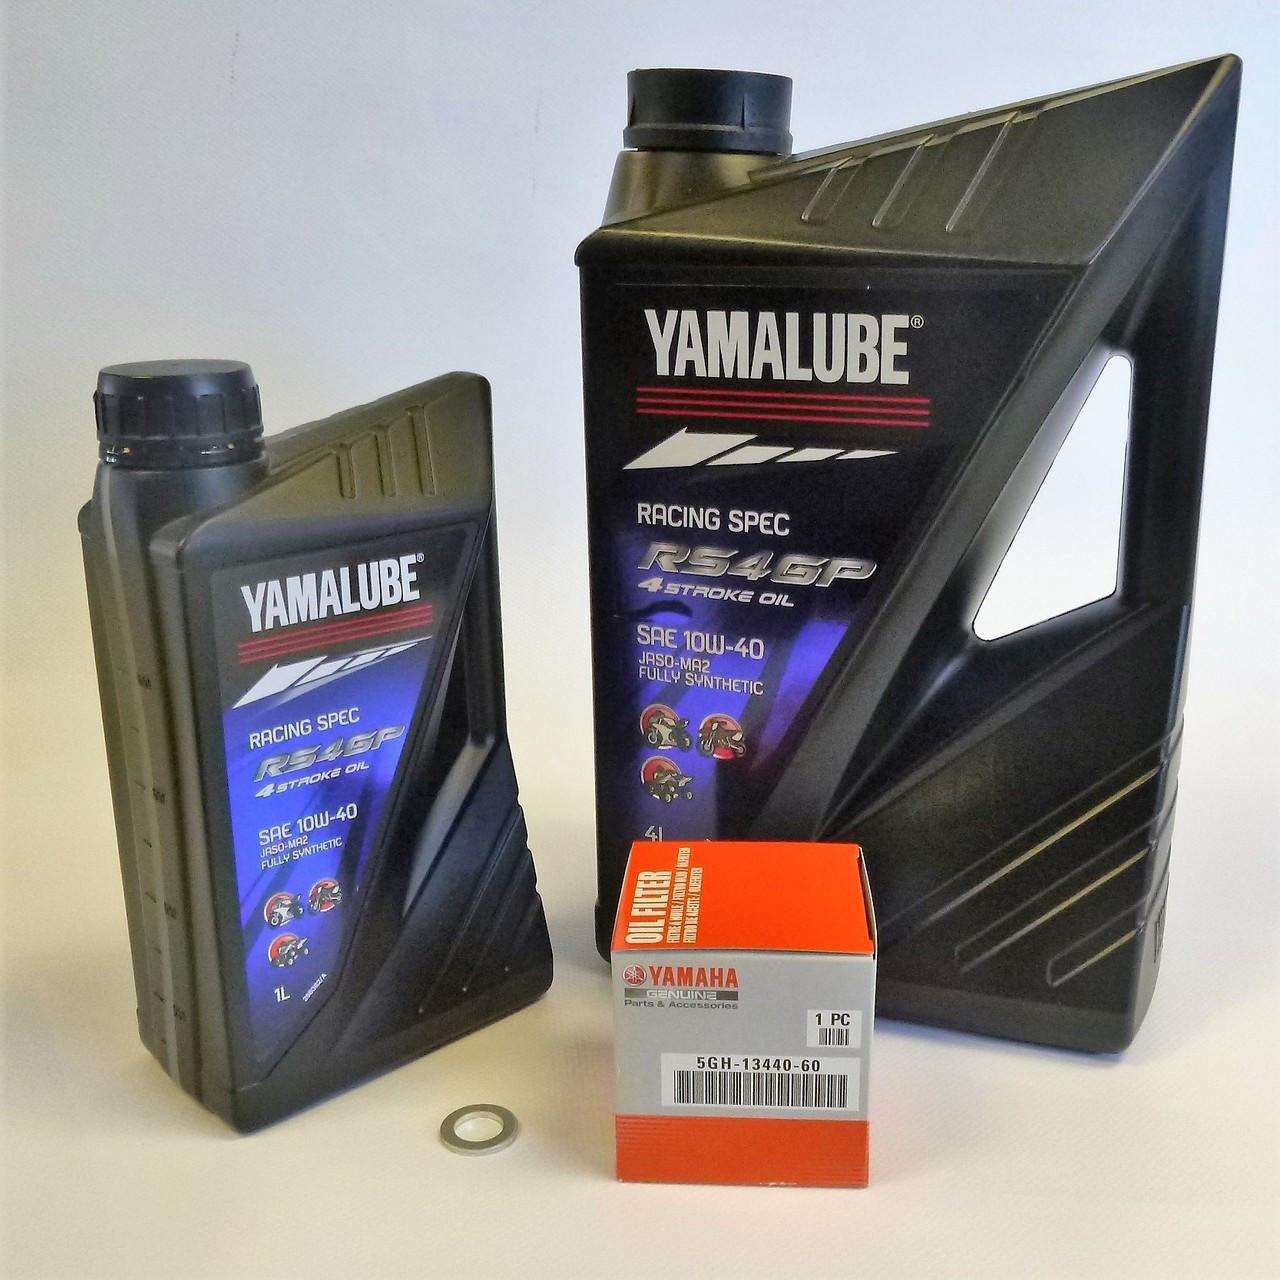 Yamalube 5l RS4GP Racing Oil Service Kit -Yamaha YZF R1 & R1M 2015 on MT-10  2016-